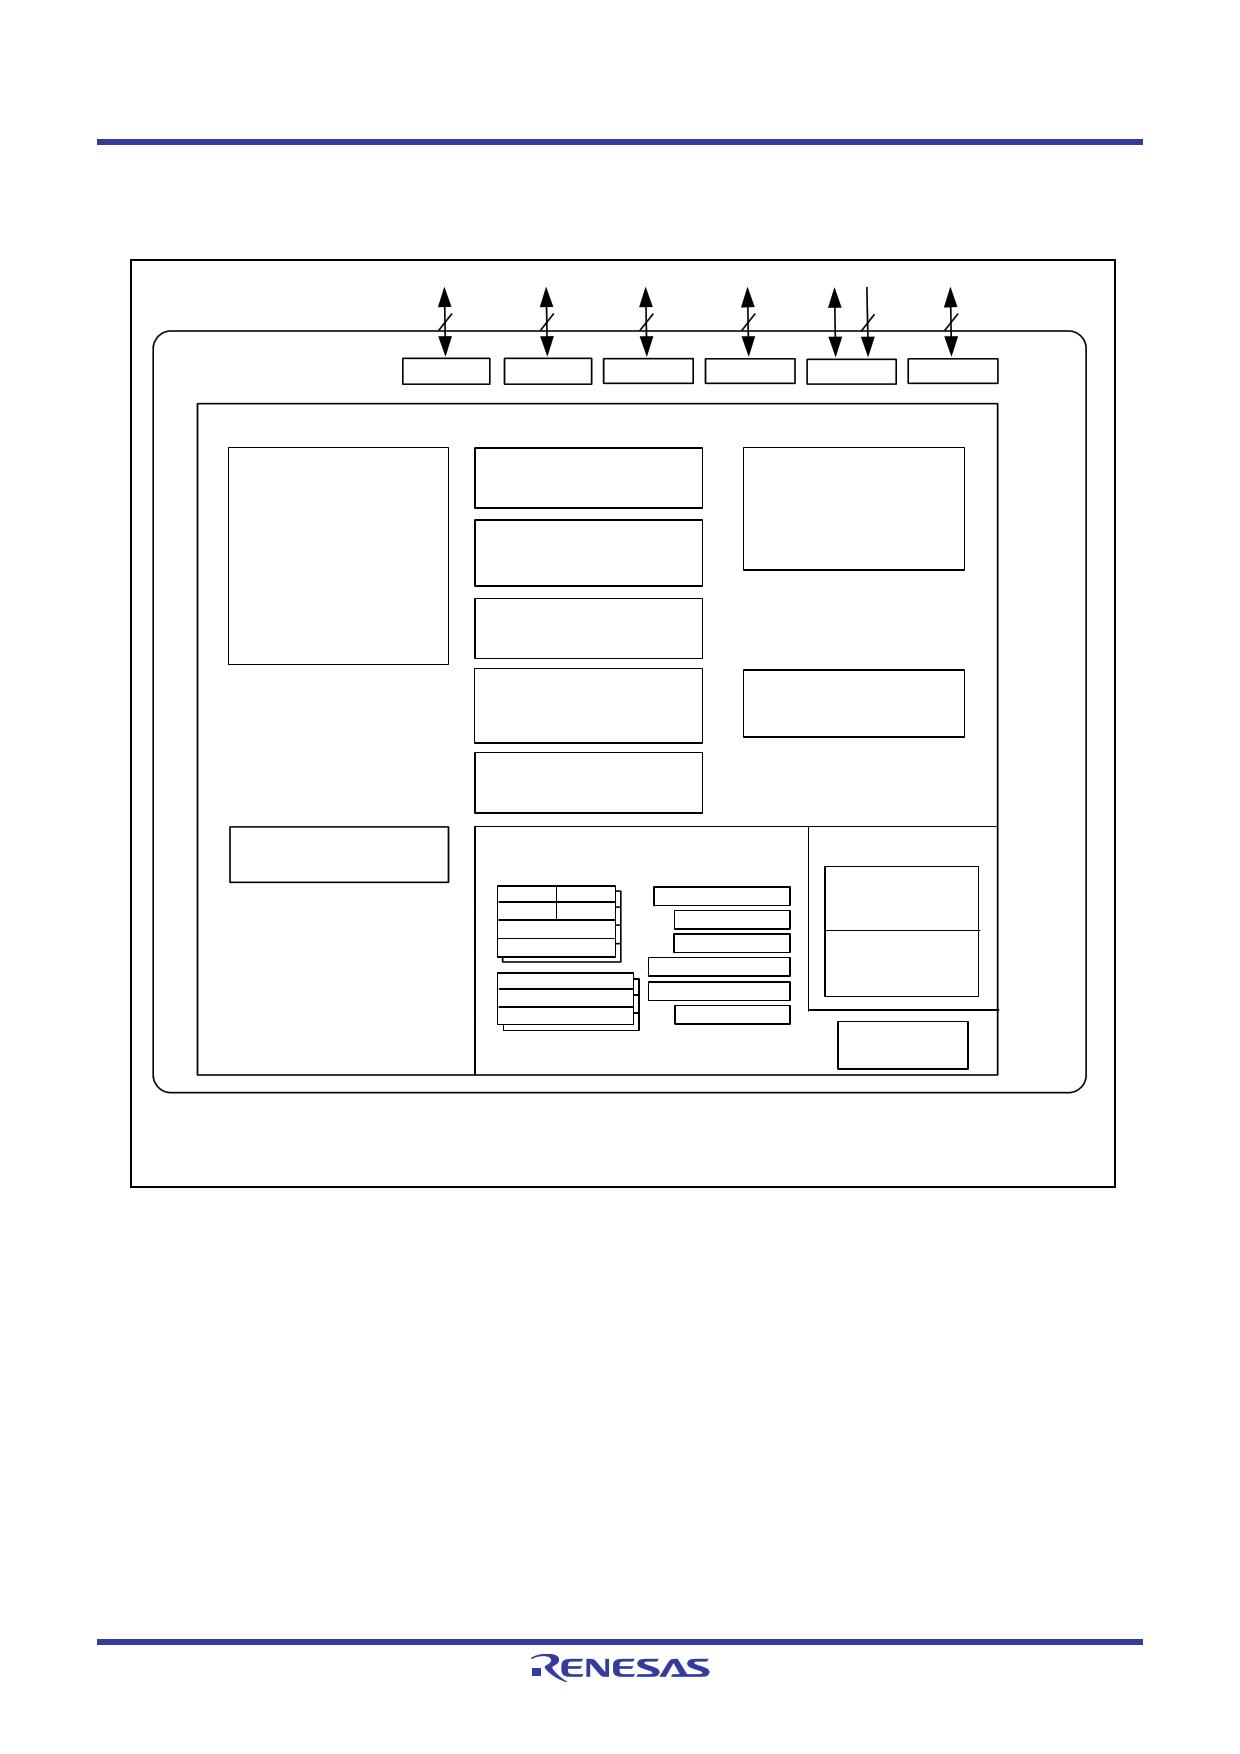 R5F2123AJFP pdf, 반도체, 판매, 대치품